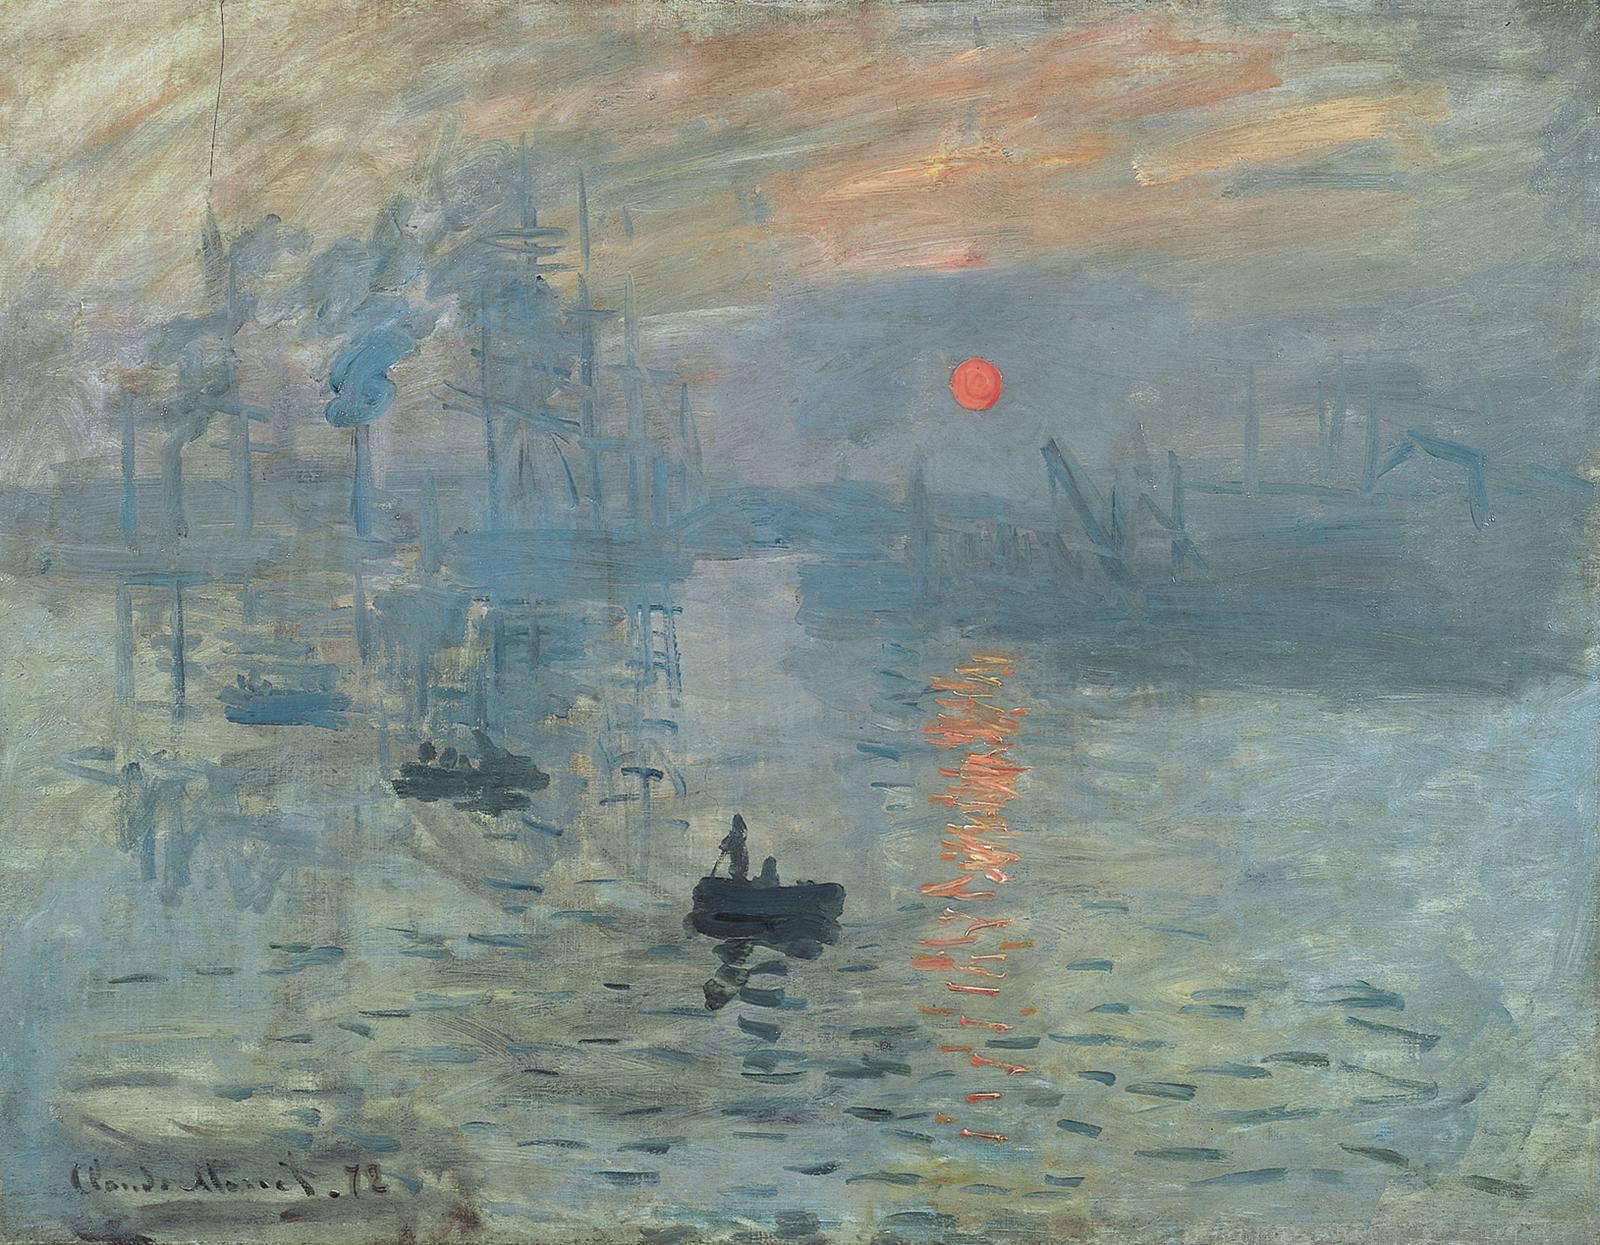 Claude_Monet,_Impression,_soleil_levant